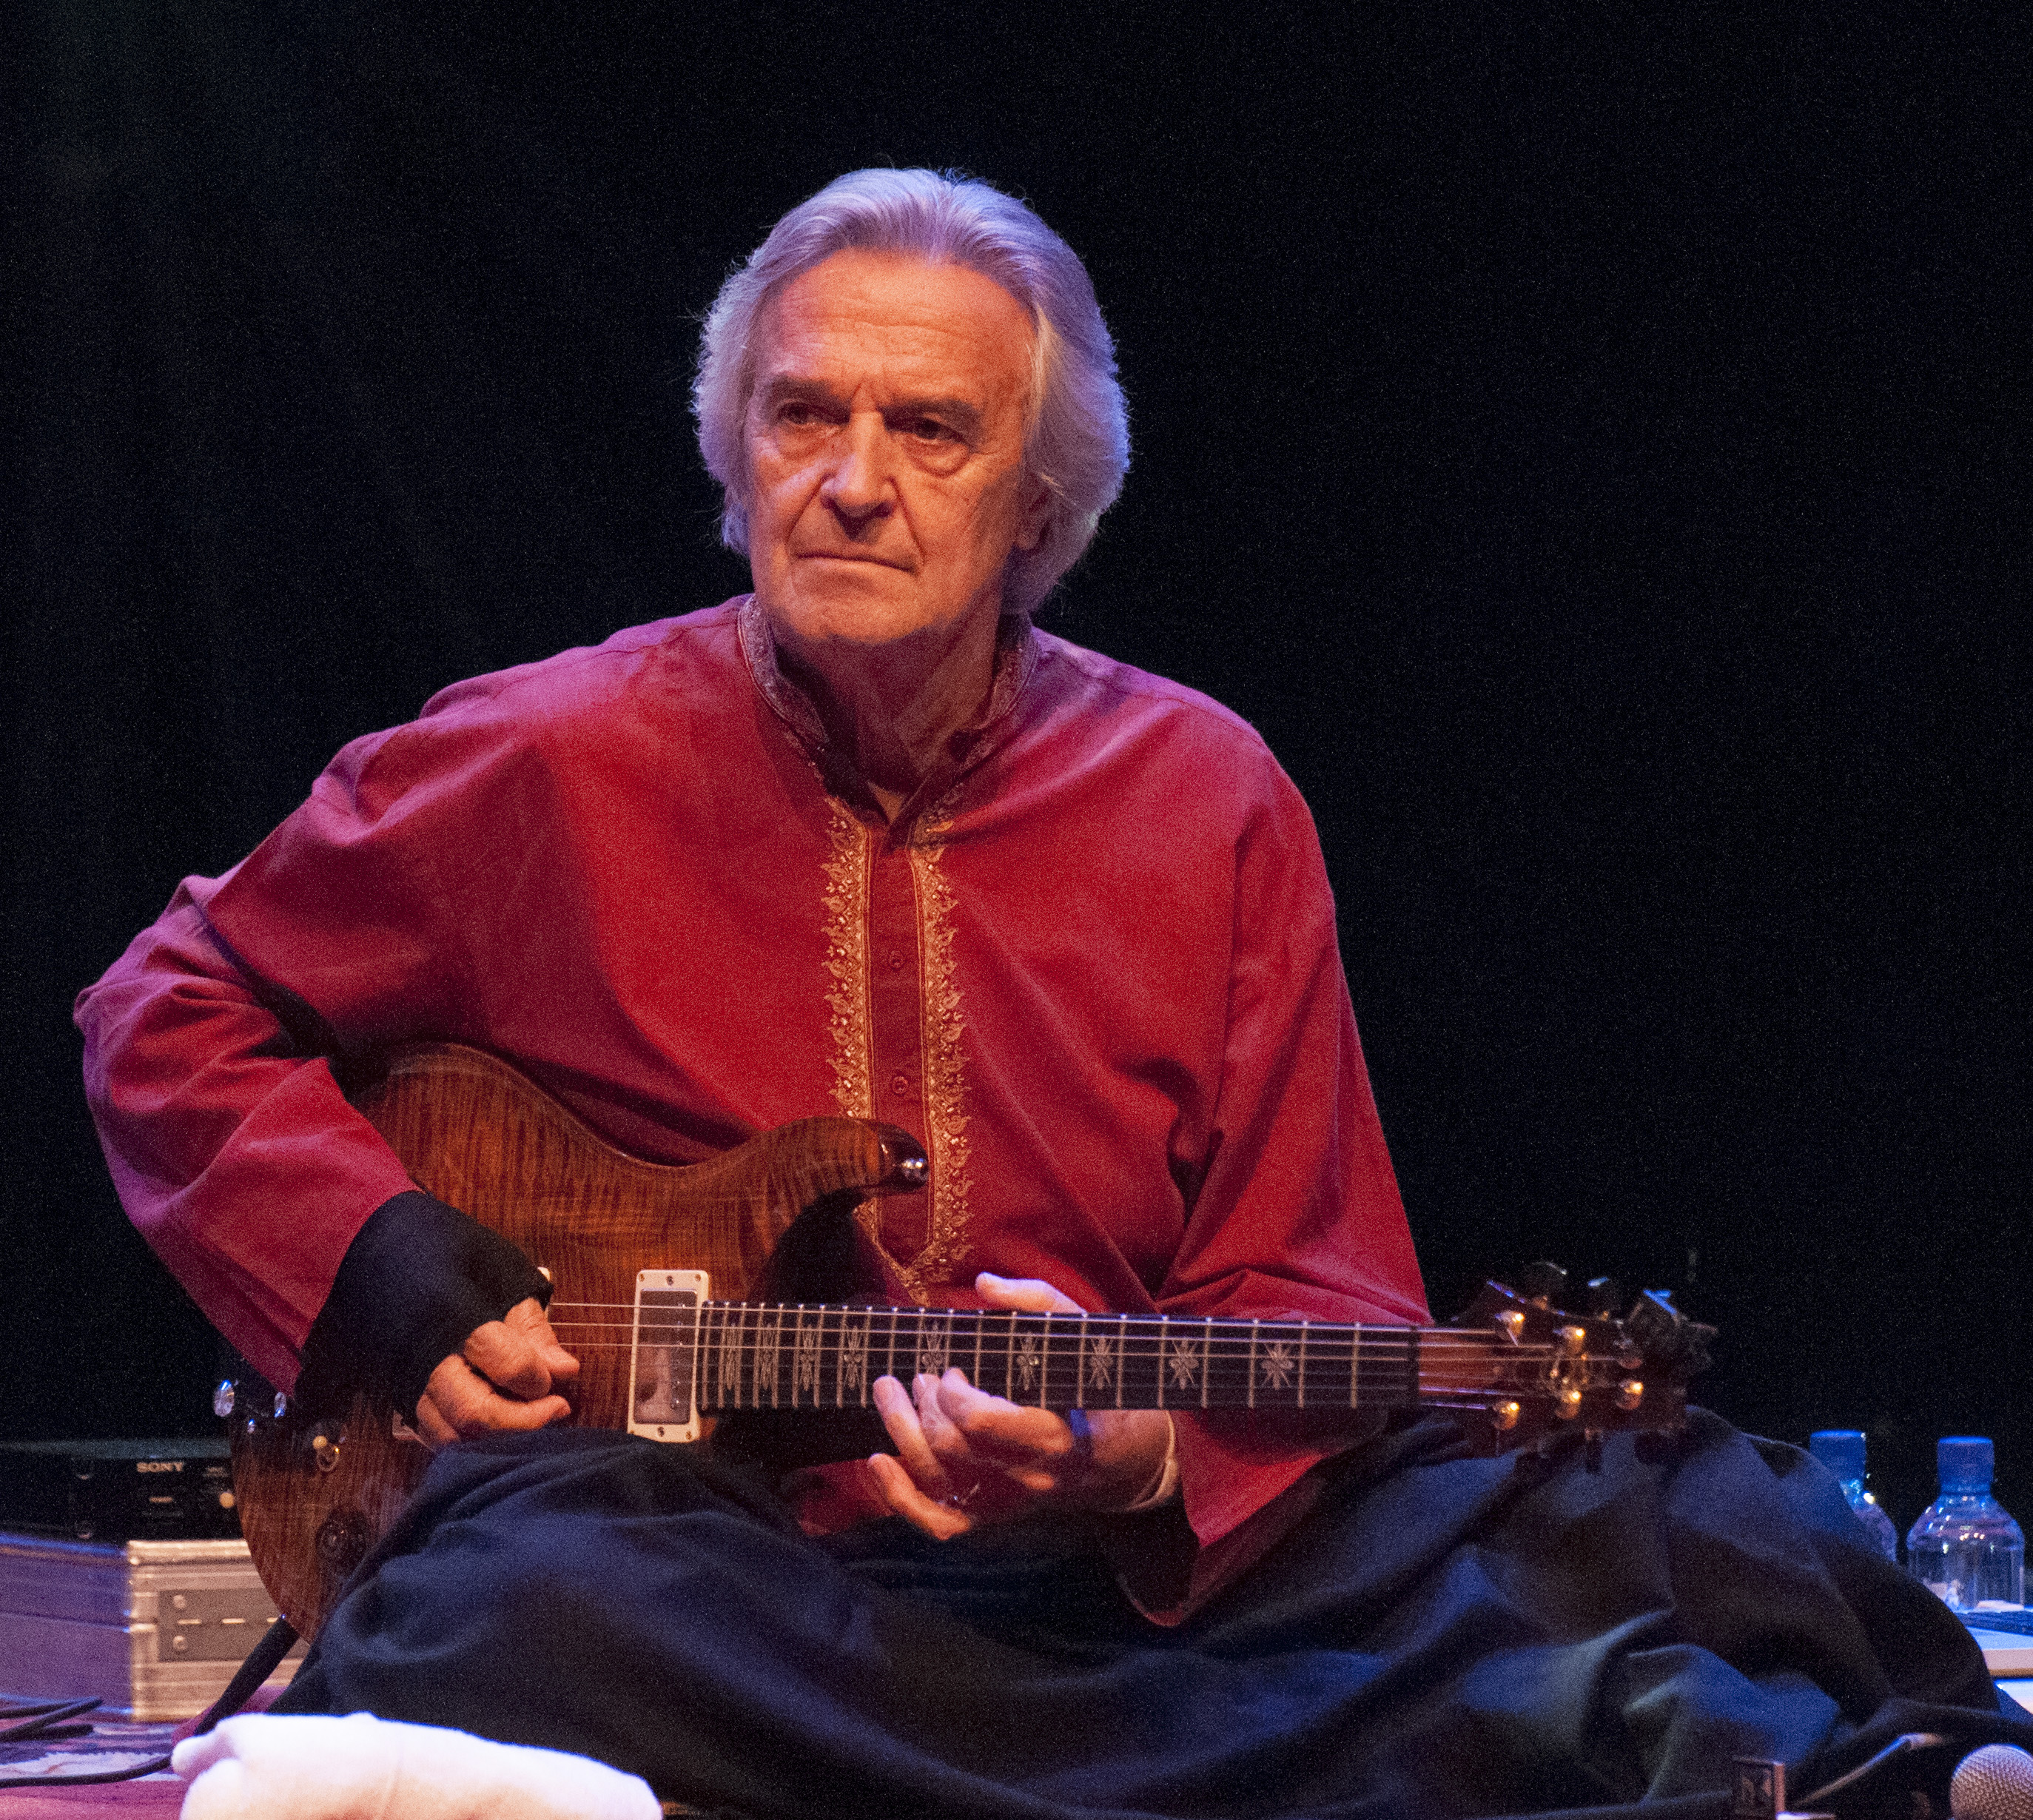 LONDON, UNITED KINGDOM - NOVEMBER 21: John McLaughlin of Remember Shakti performs on stage during day 7 of London Jazz Festiv